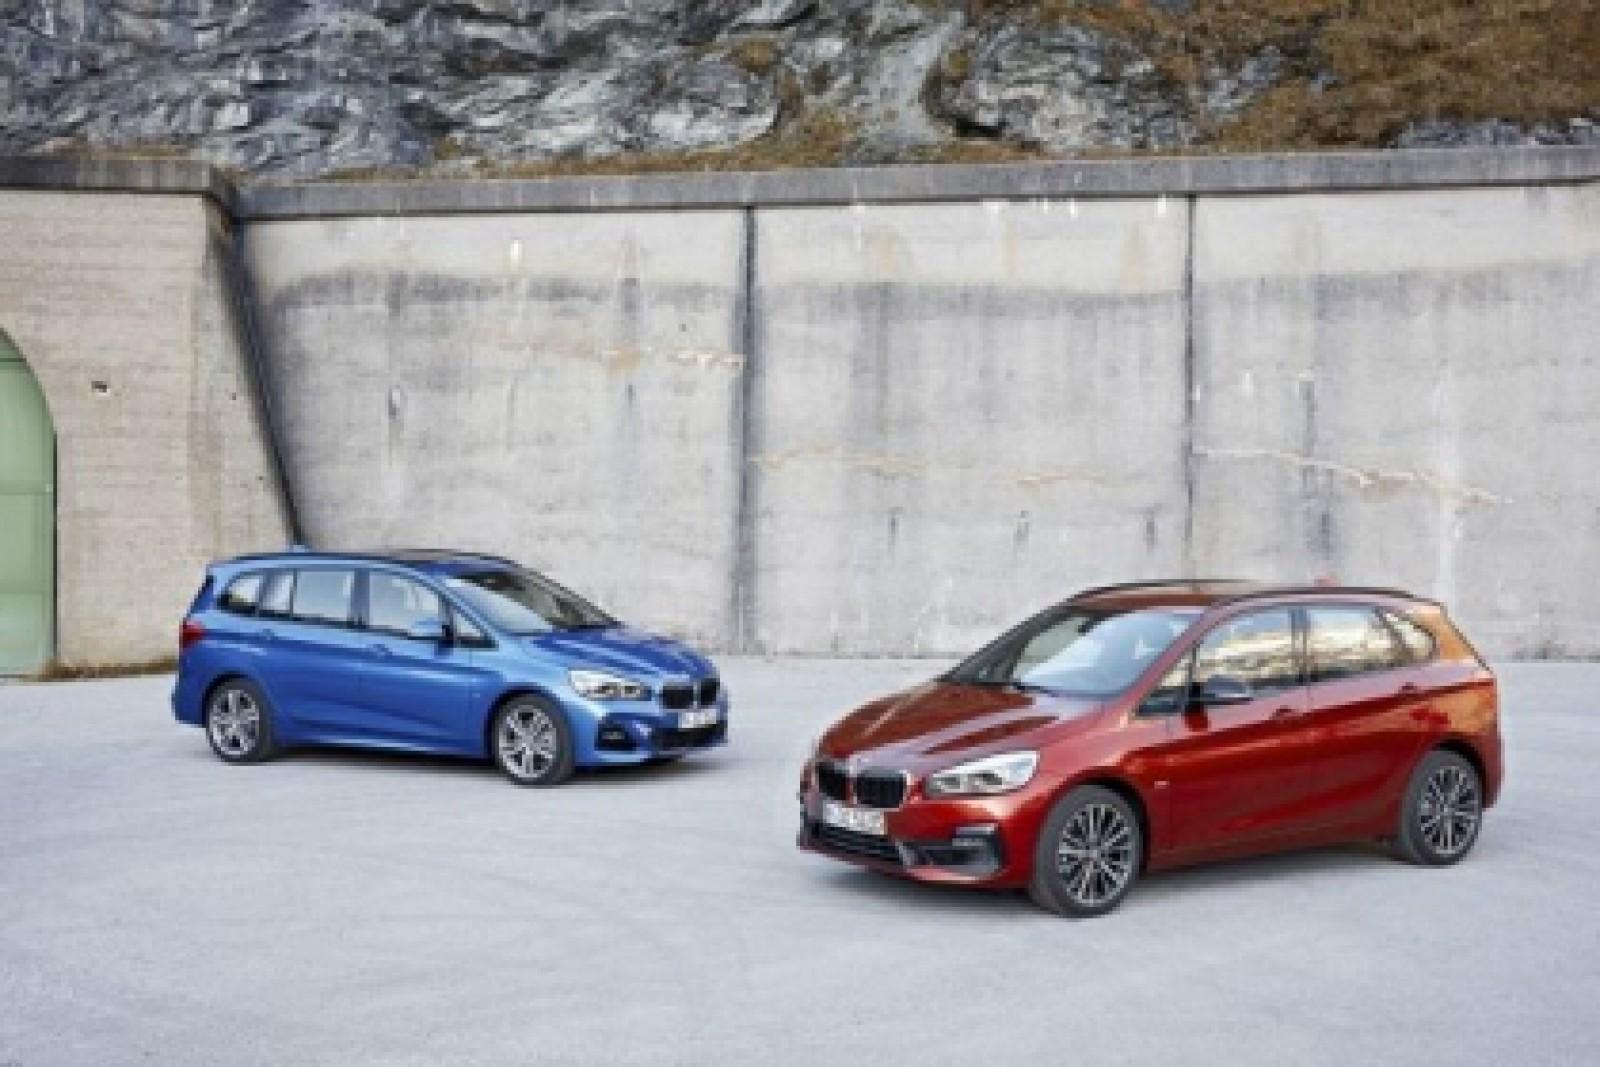 (foto) Facelift pentru BMW Seria 2 Active Tourer şi BMW Seria 2 Gran Tourer